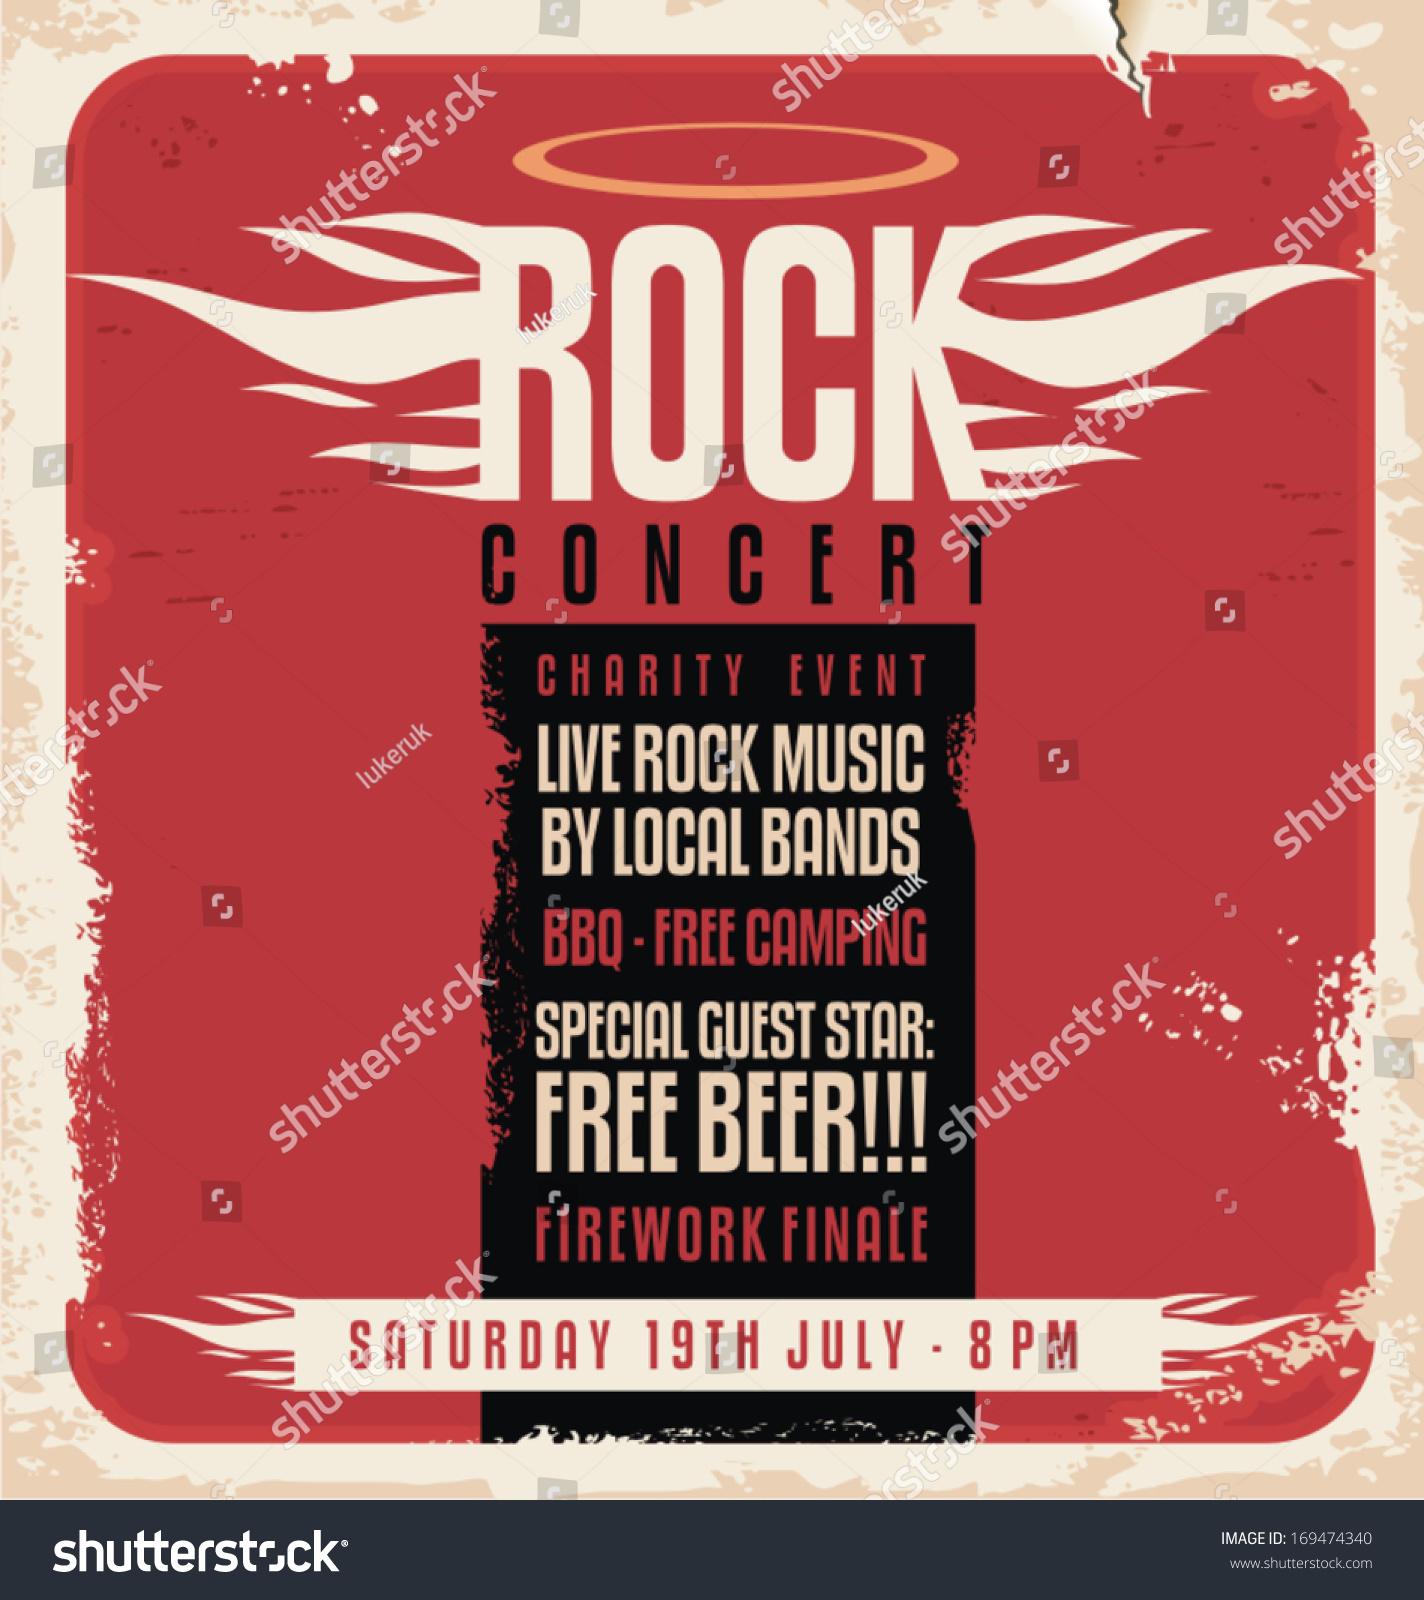 Design poster retro - Rock Concert Retro Poster Design Template On Old Paper Texture